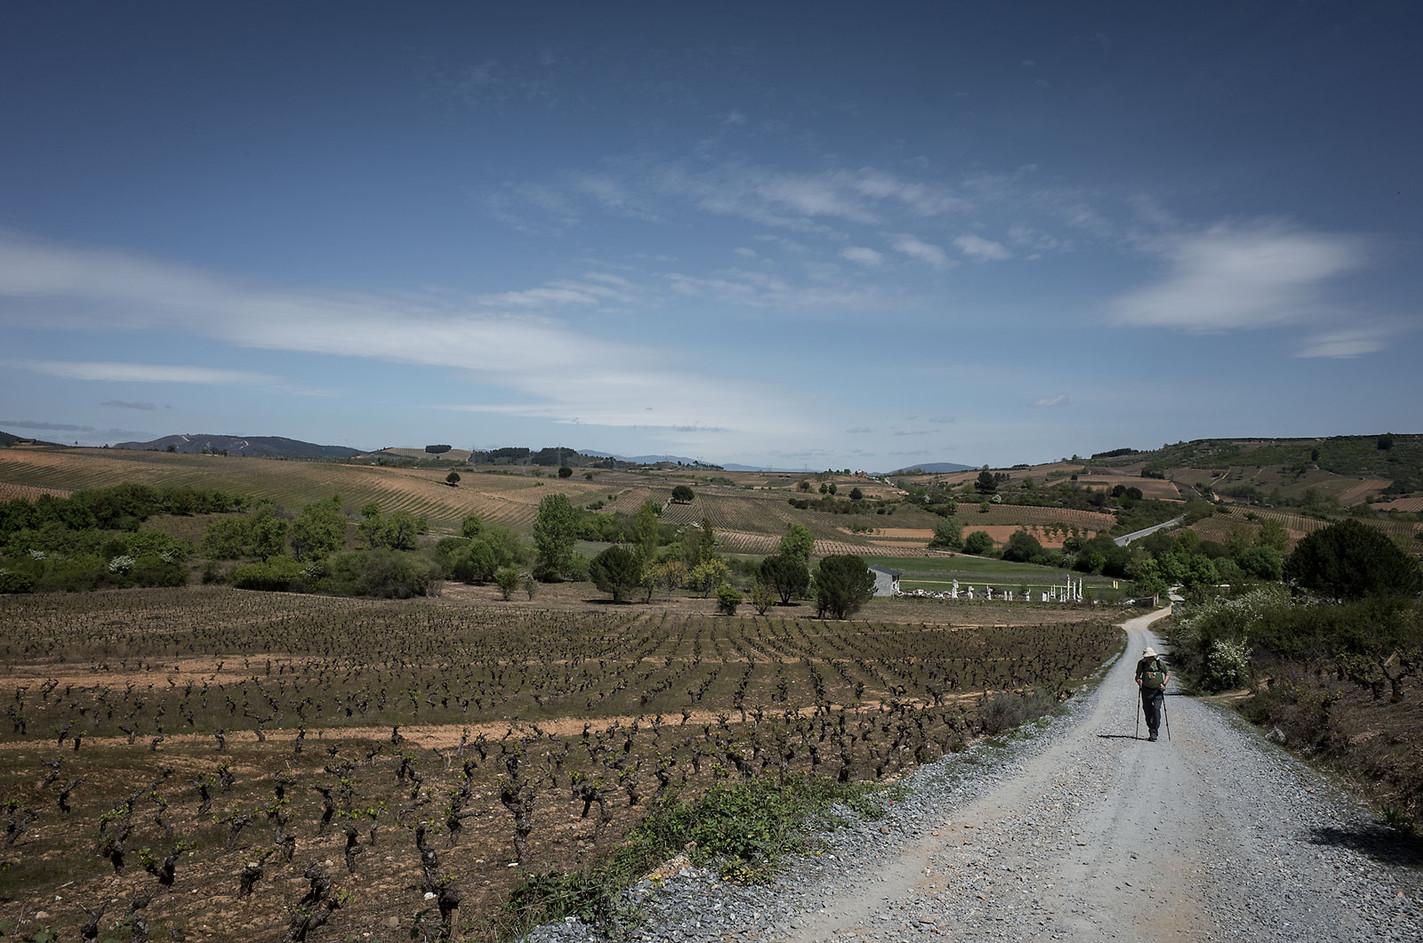 A pilgrim walking through the vineyards in the Bierzo wine region.